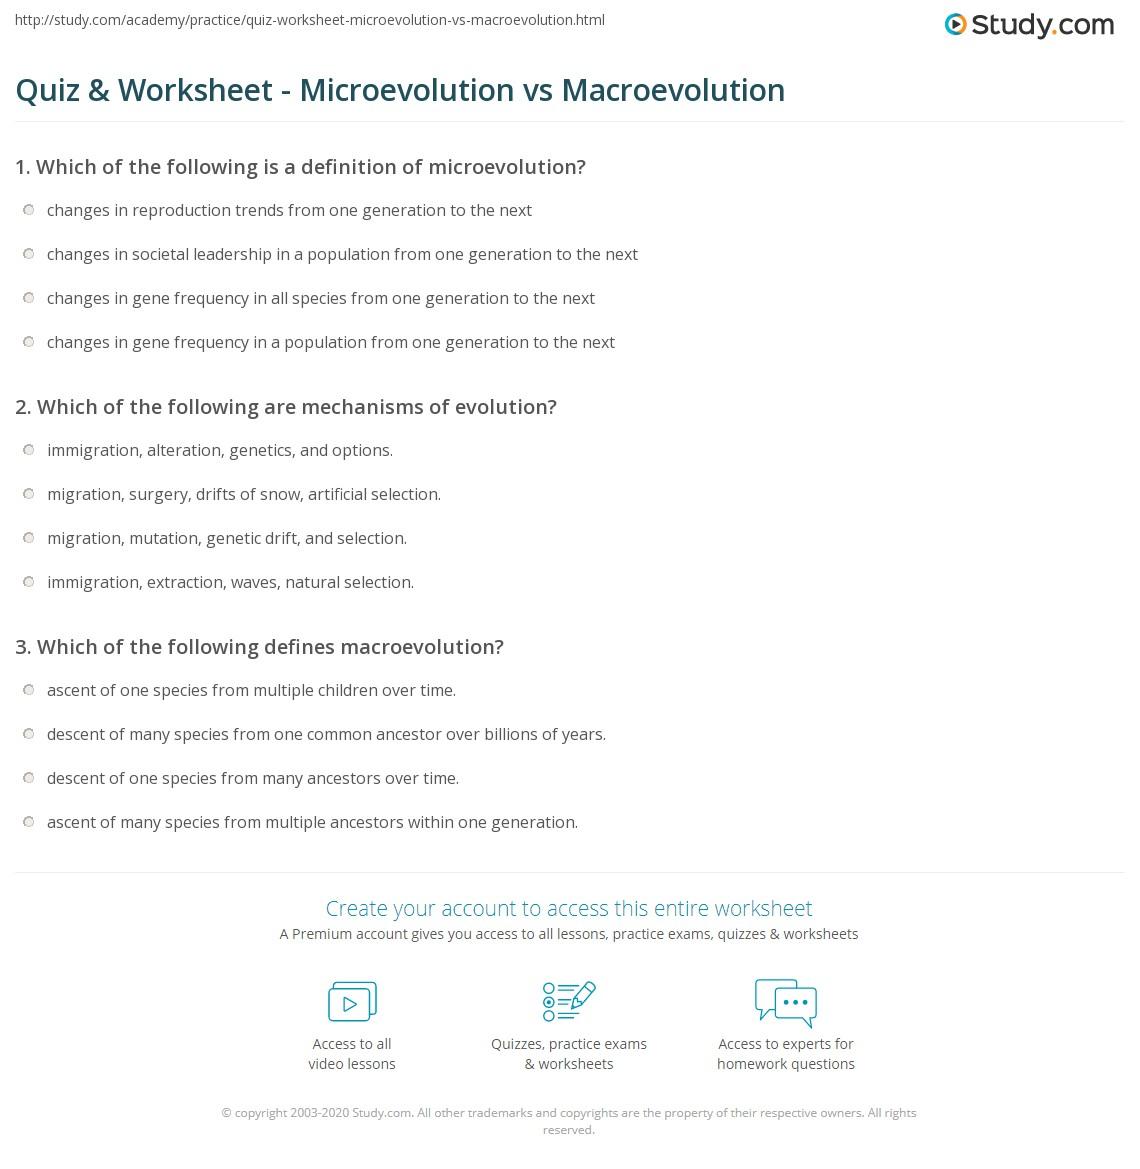 Microevolution And Macroevolution